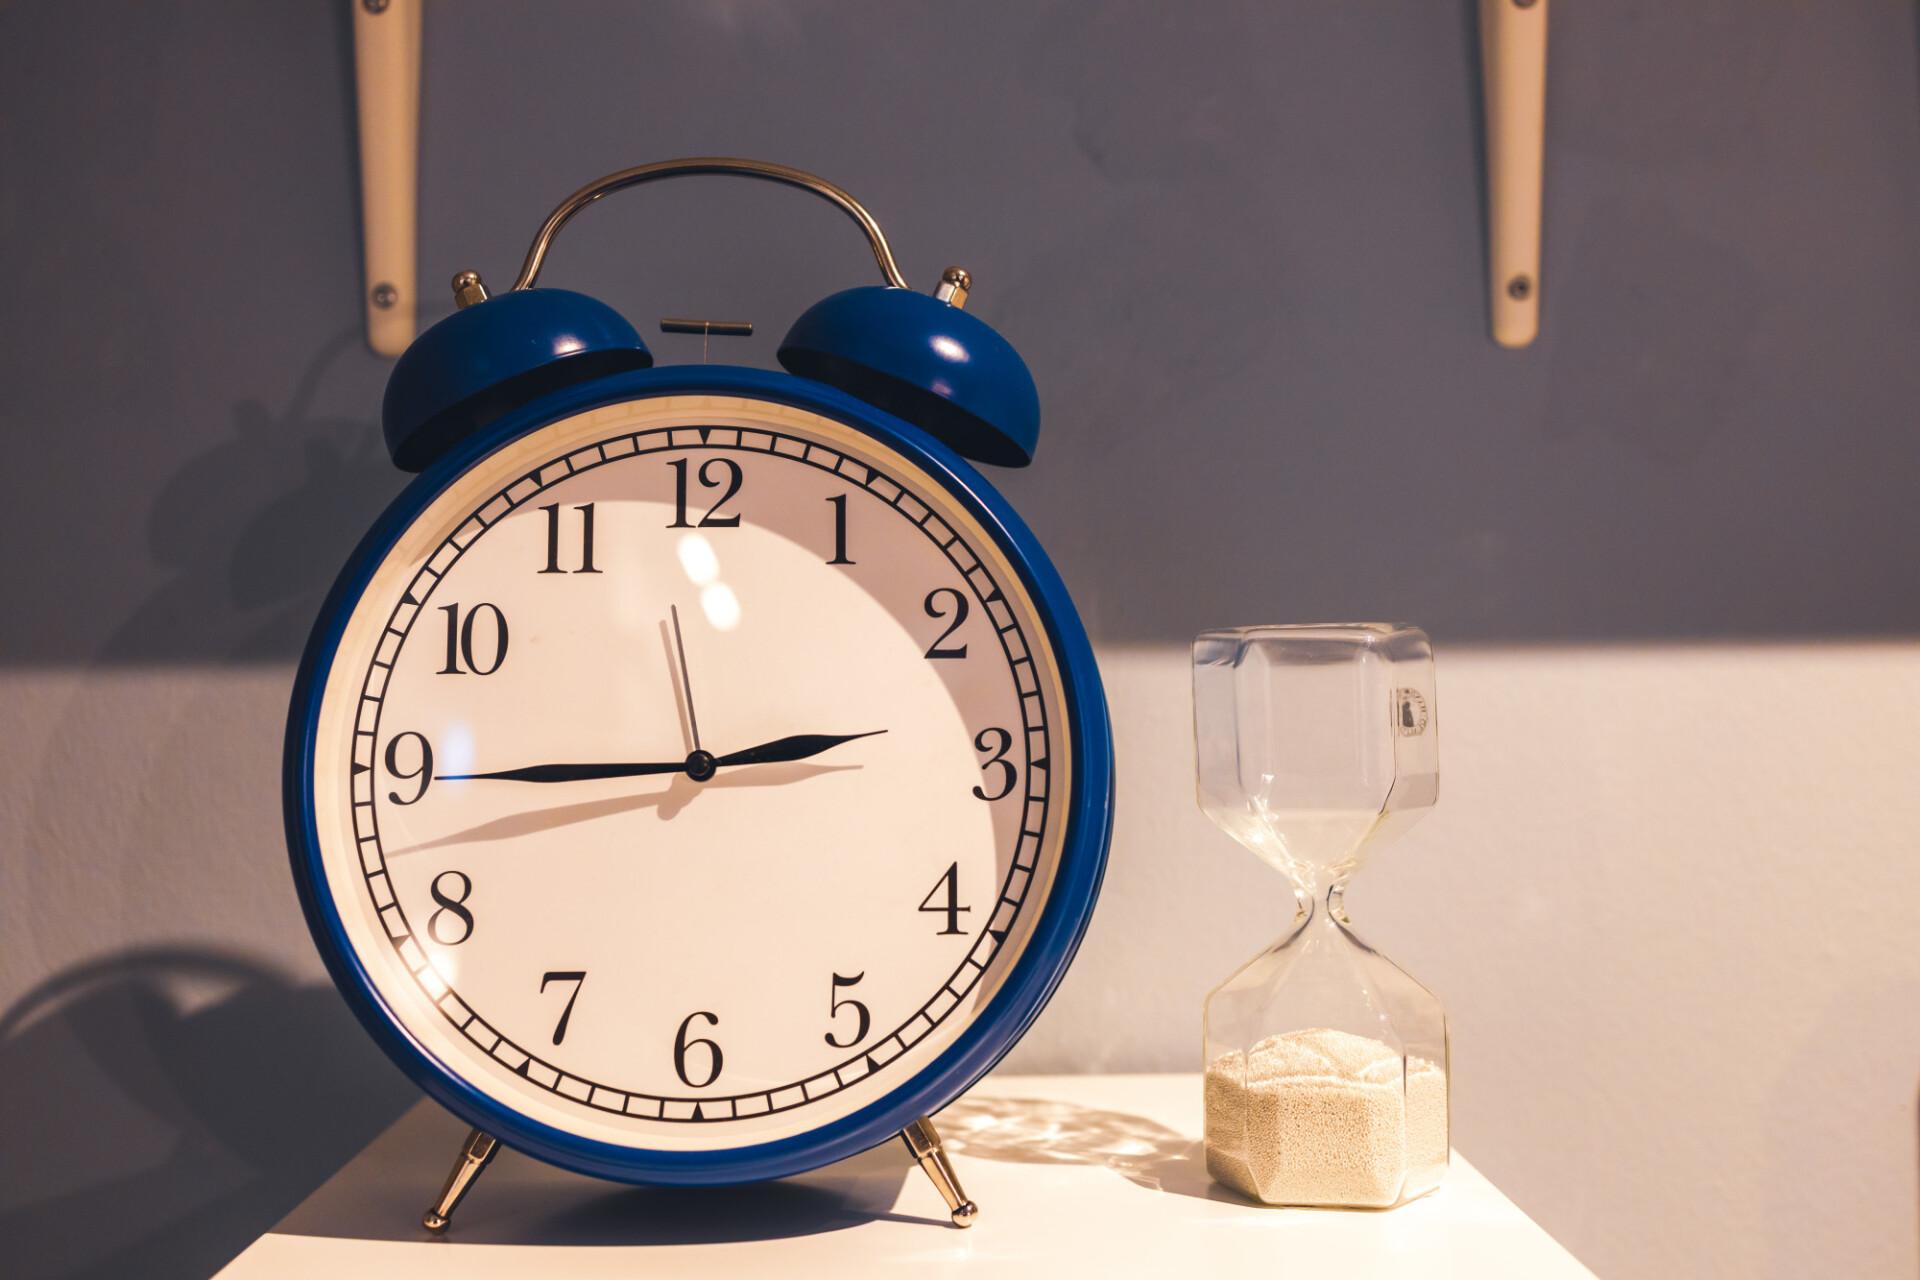 Blue alarm clock and sandglass